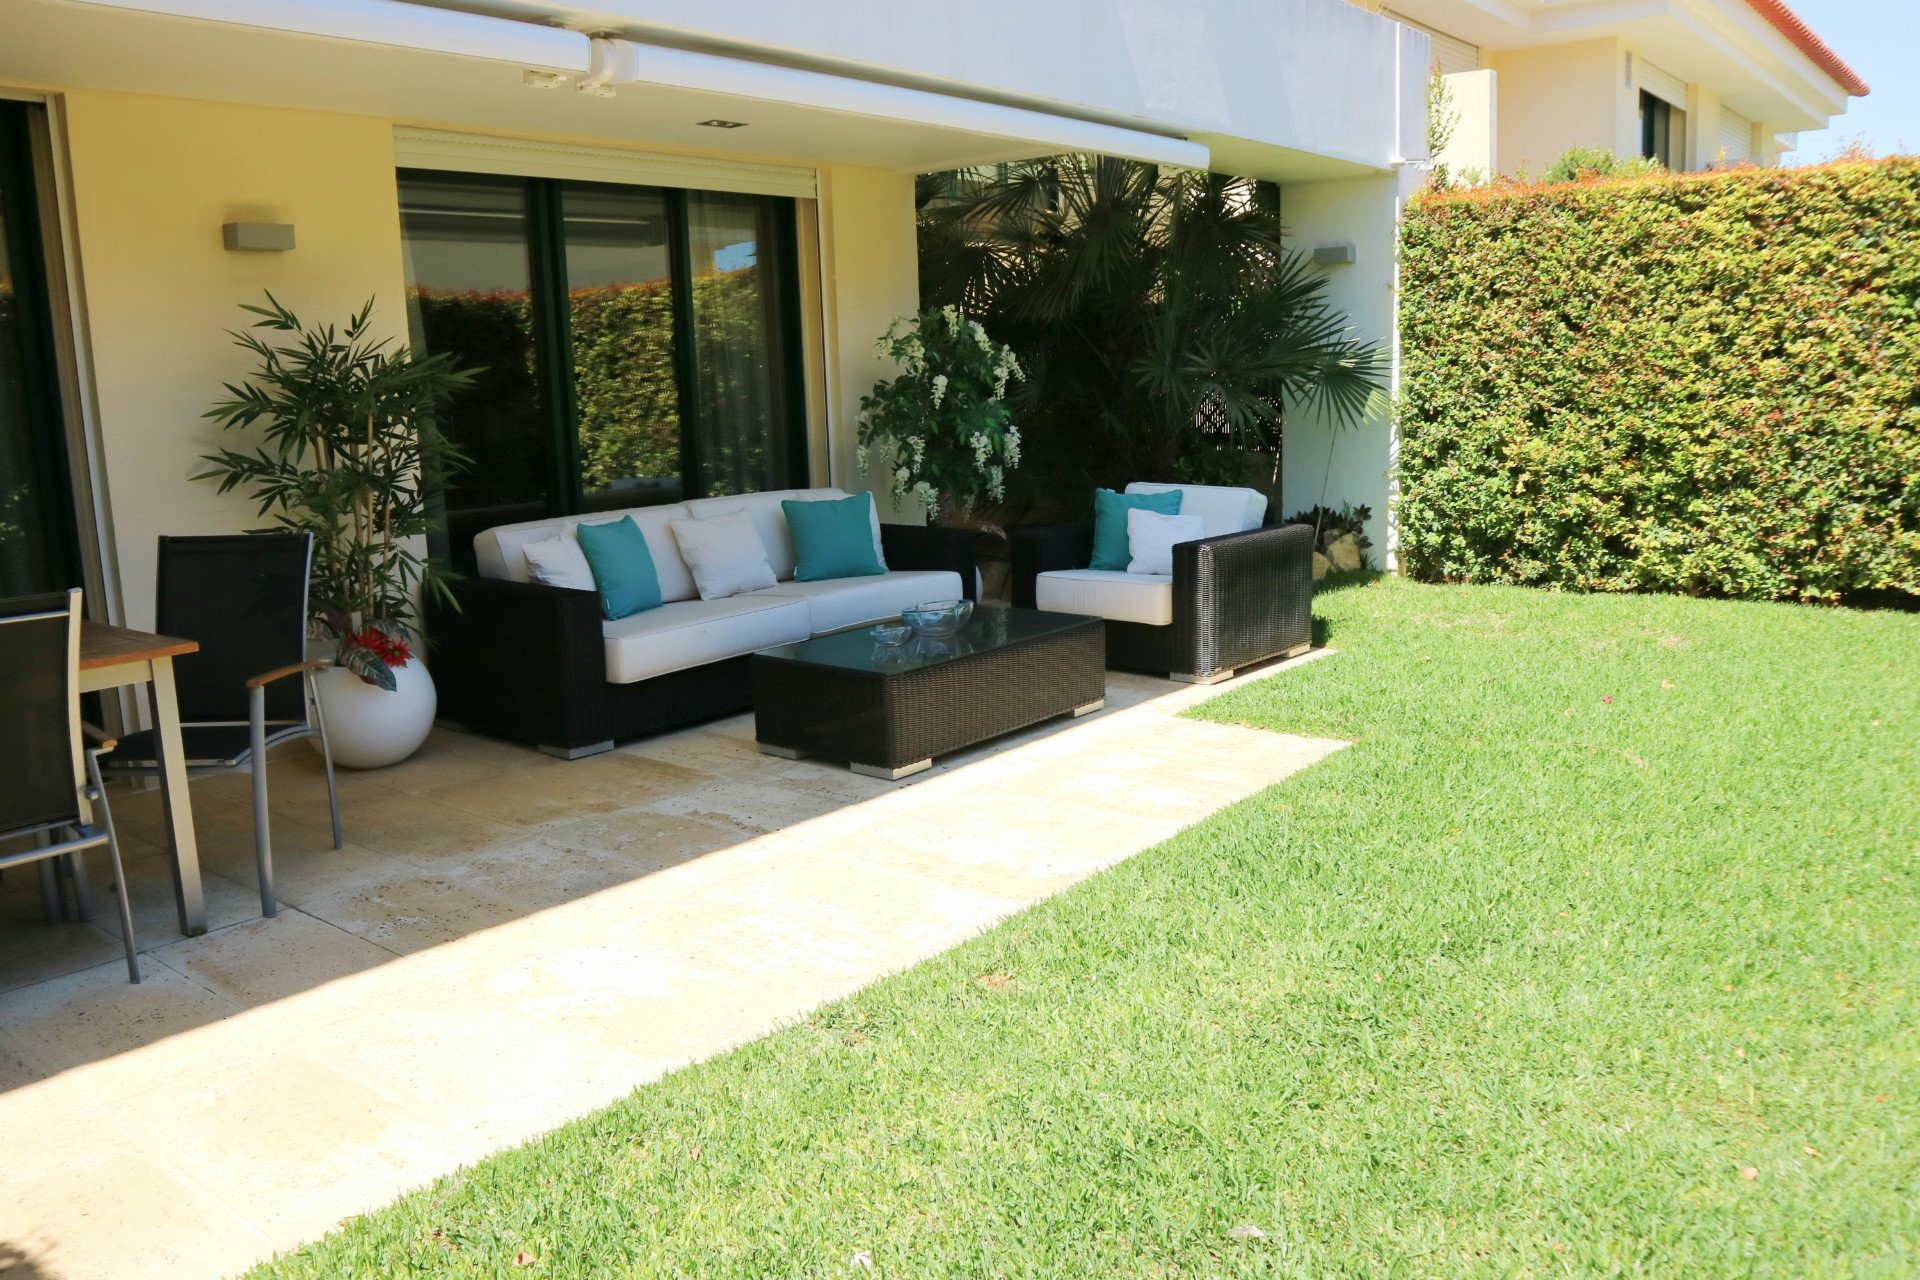 4 Bedroom Apartment Cascais, Lisbon Ref: AAI335